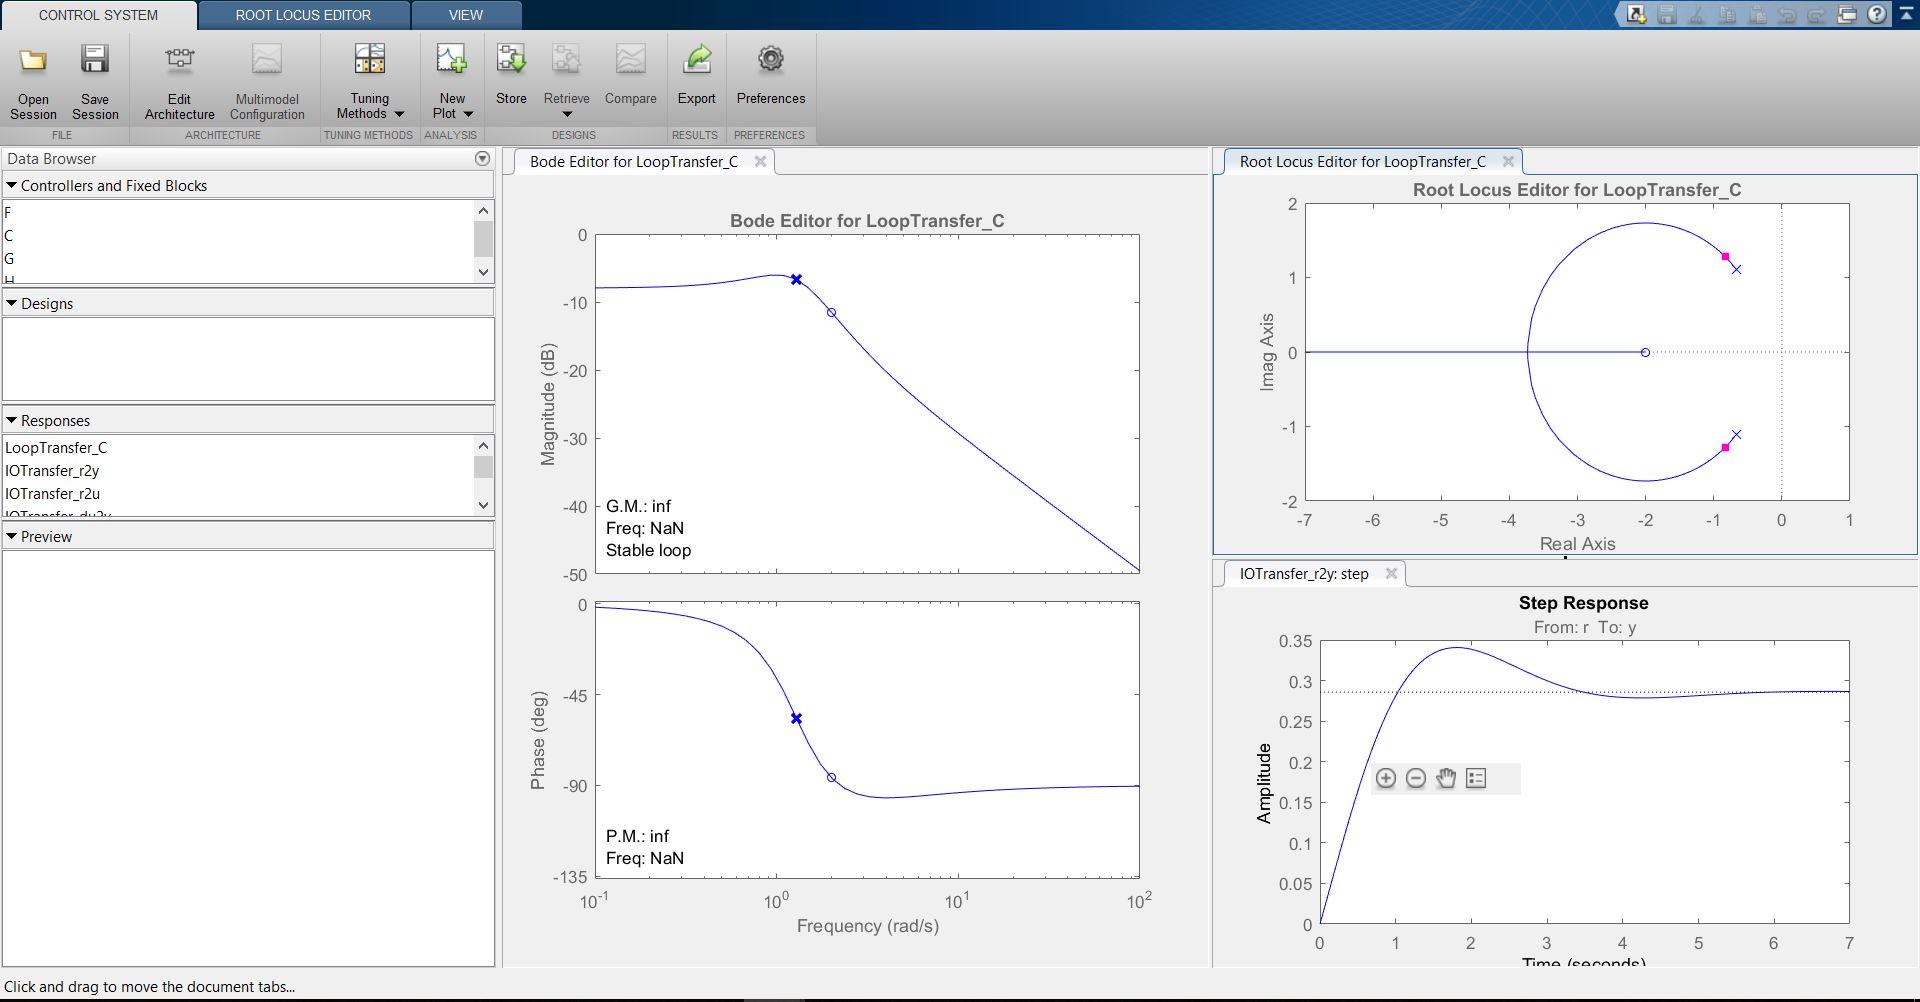 p4 1 کاربرد متلب در مهندسی کنترل